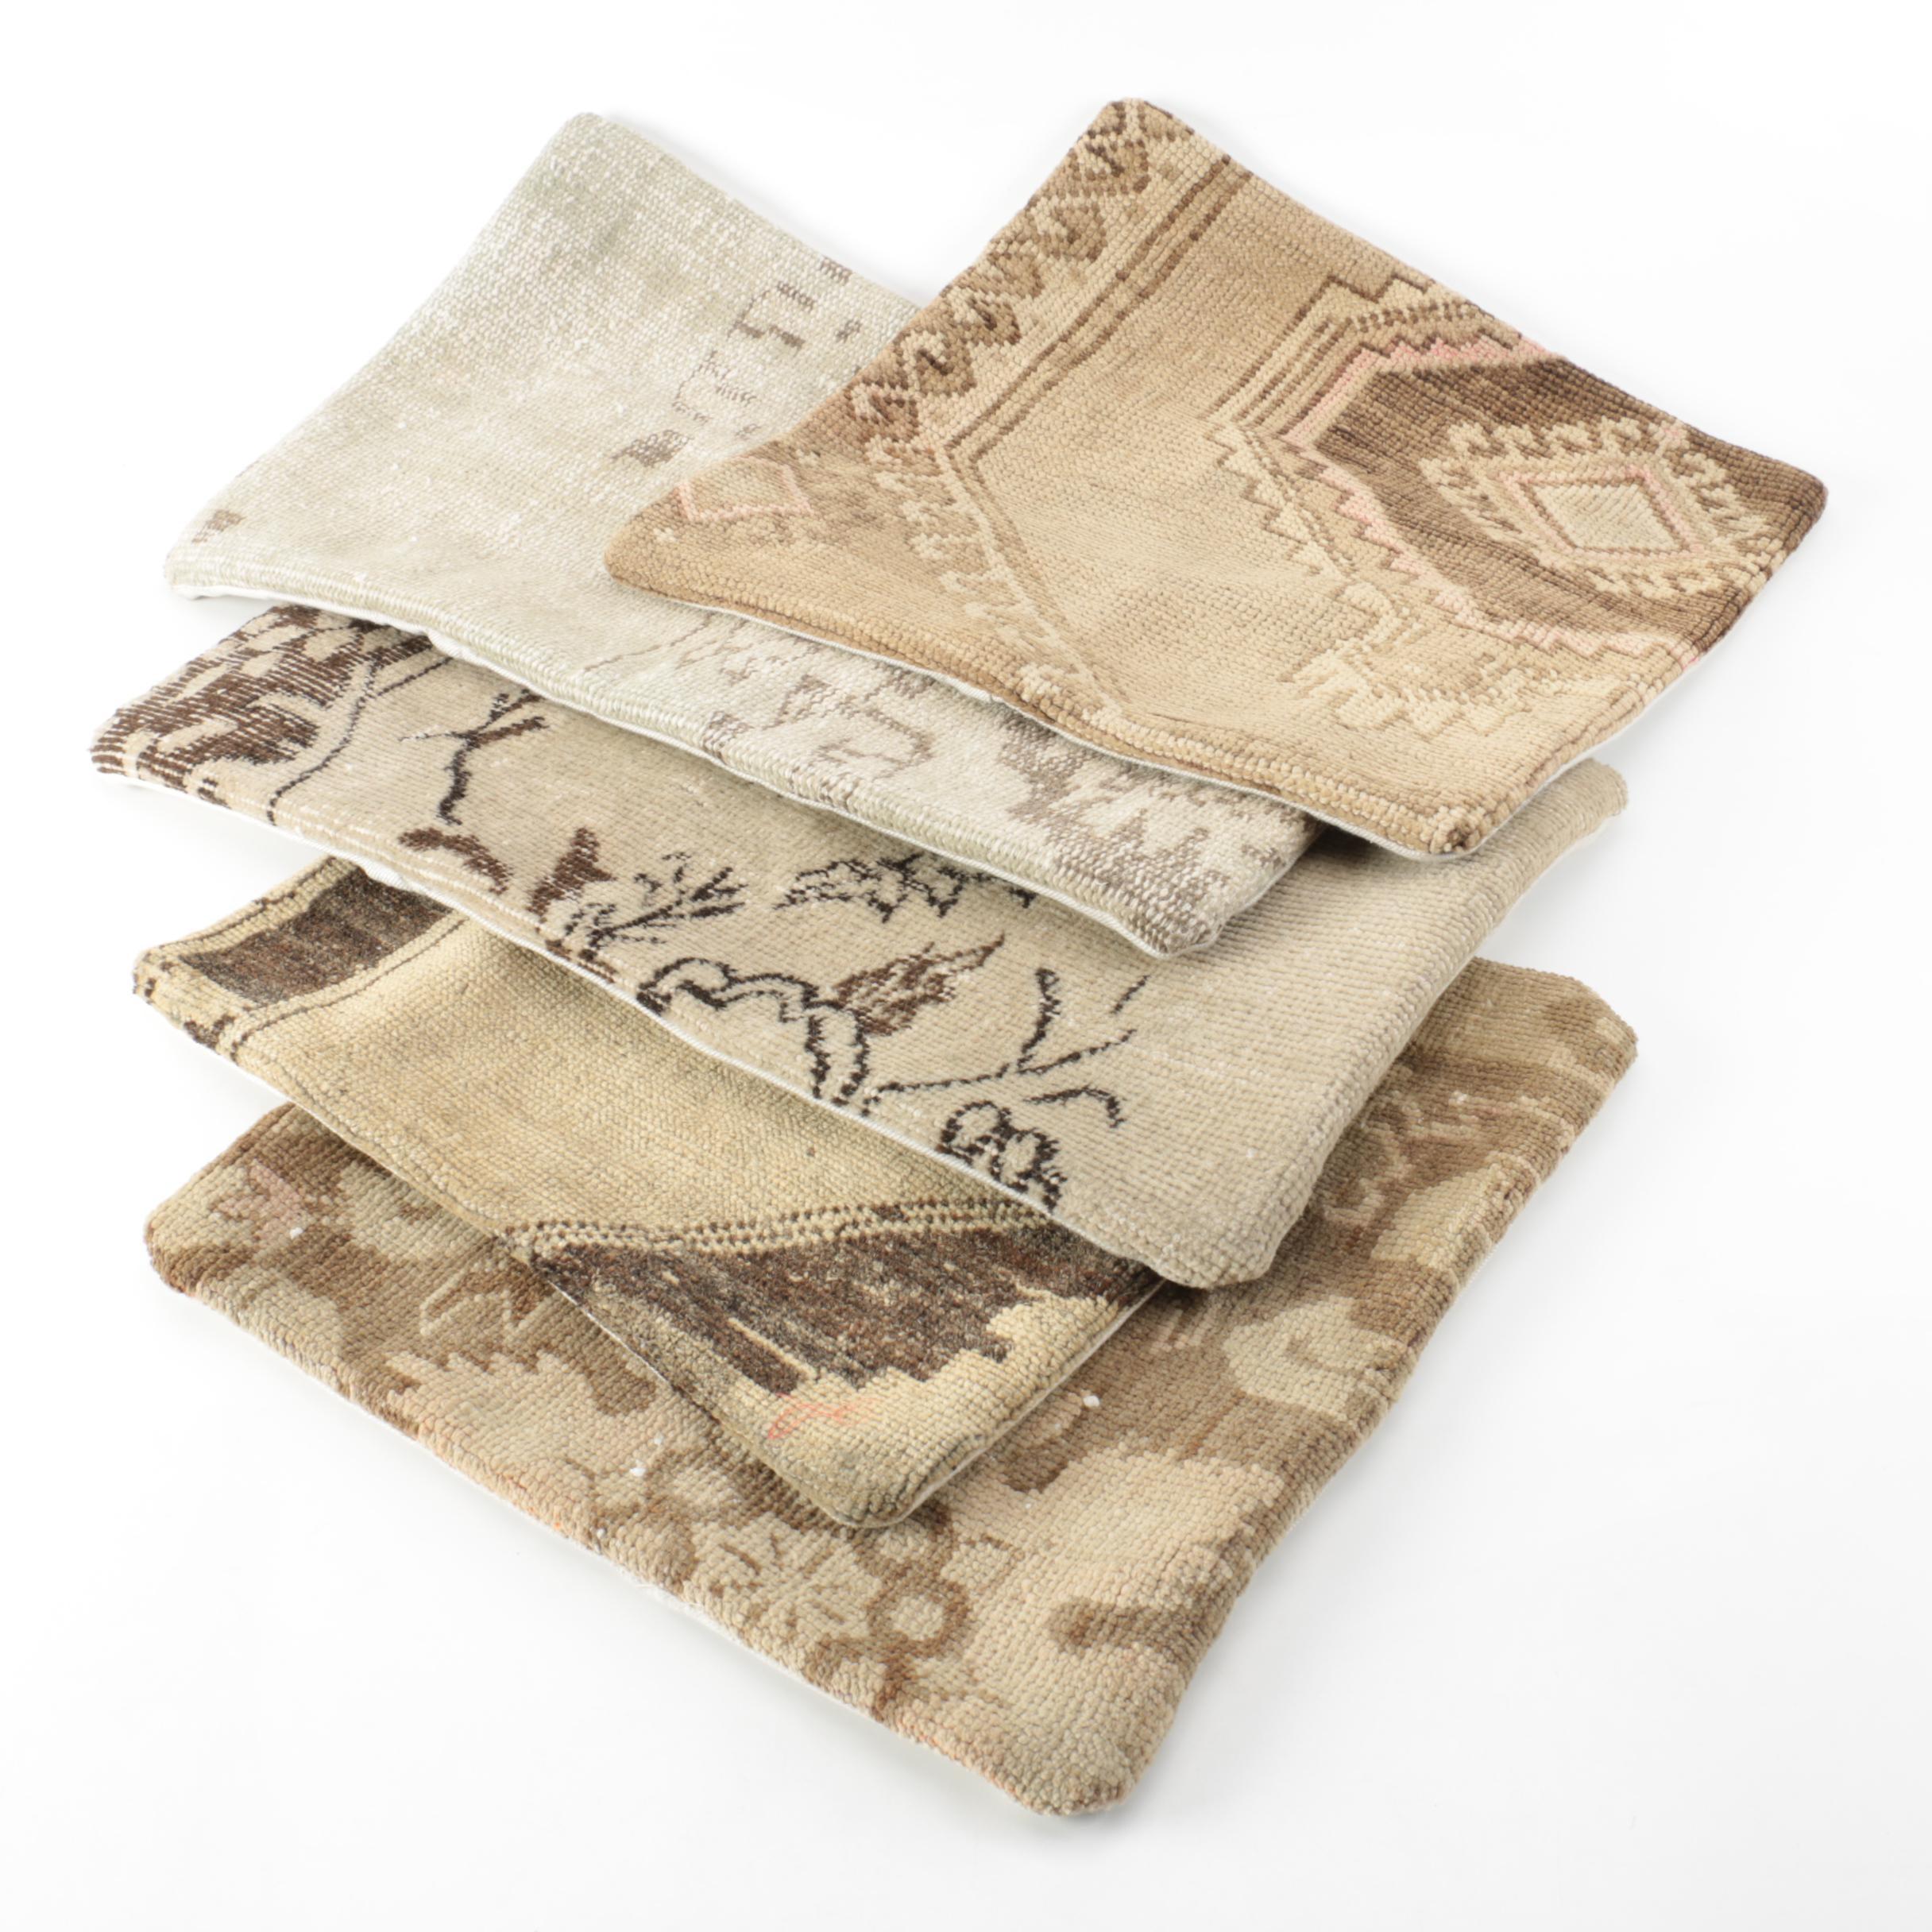 Handwoven Carpet Remnant Decorative Pillow Covers